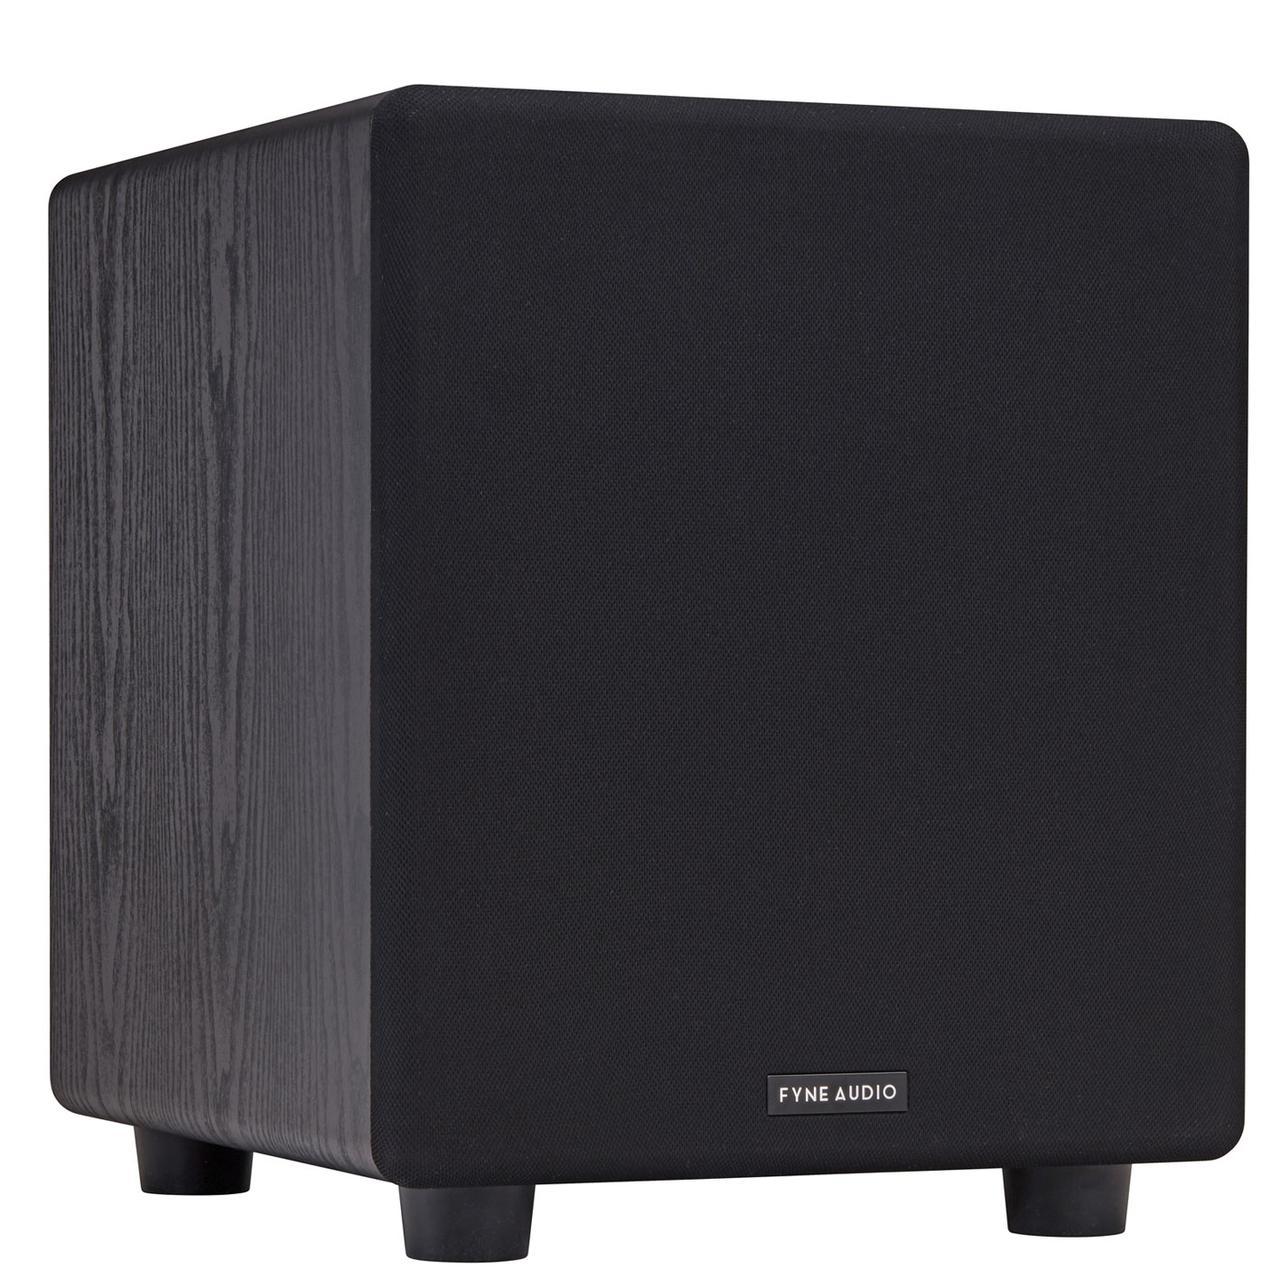 Активный сабвуфер Fyne Audio F3.10 SUB Black Ash